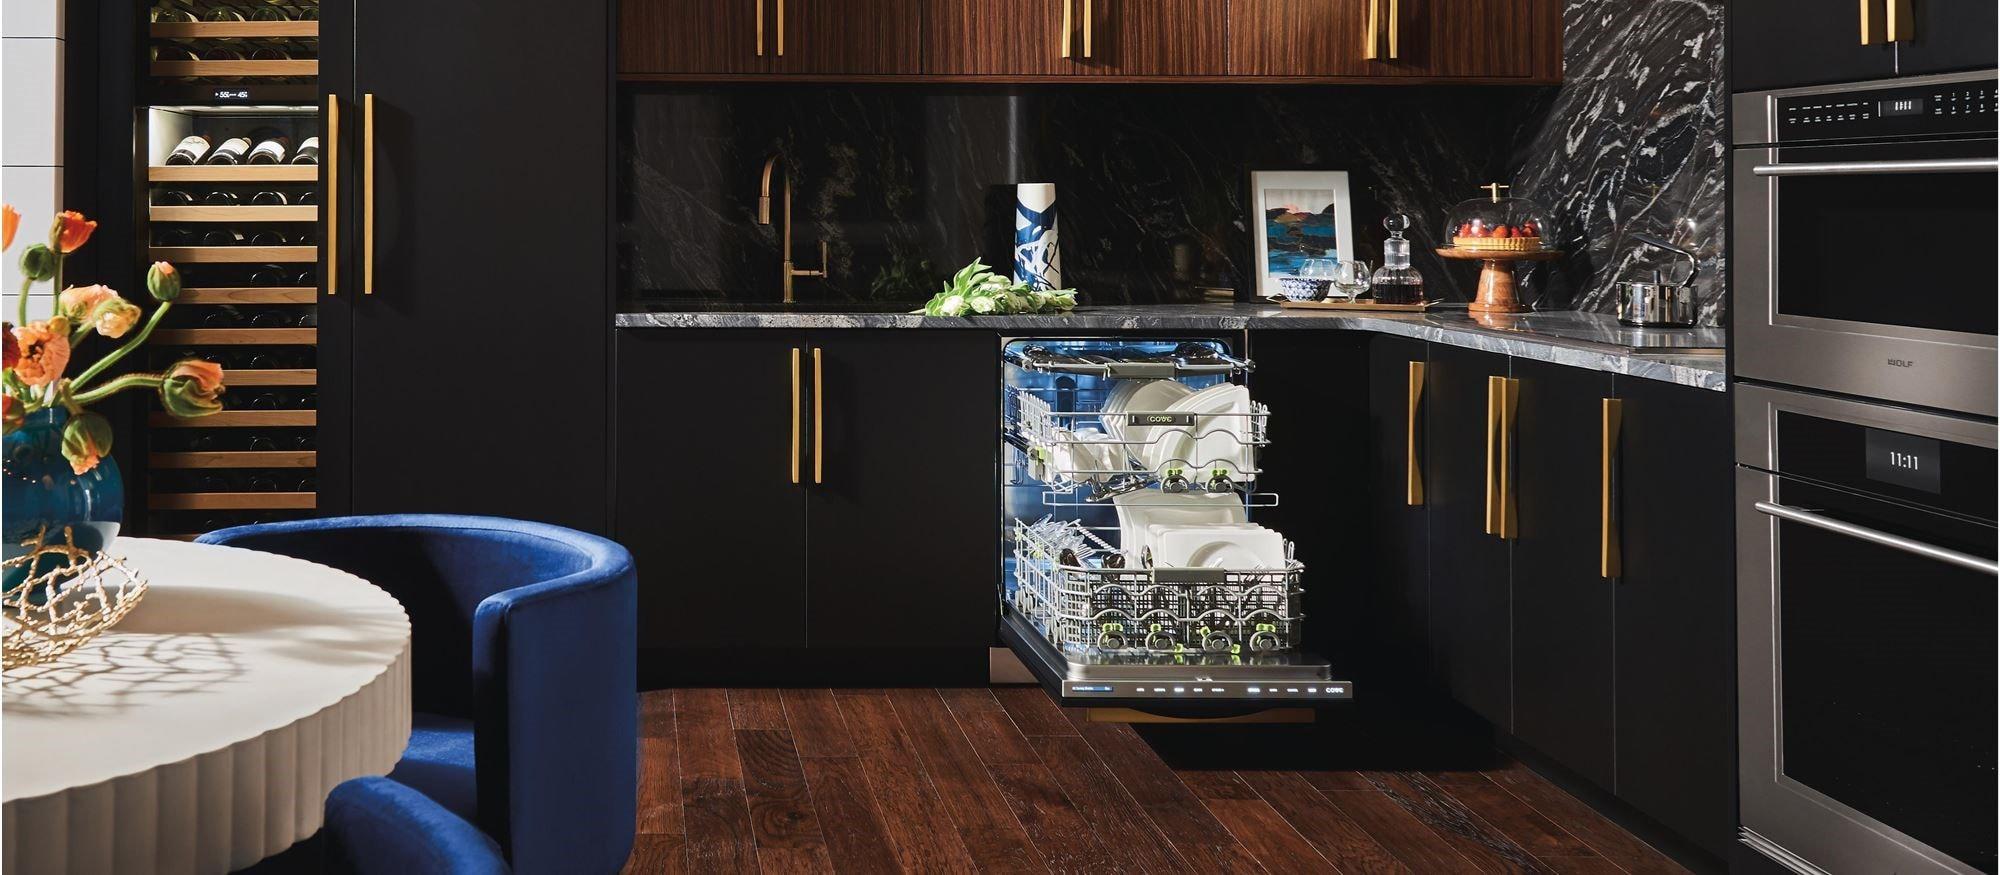 Best Panel Ready Dishwashers 2020 Cove 24